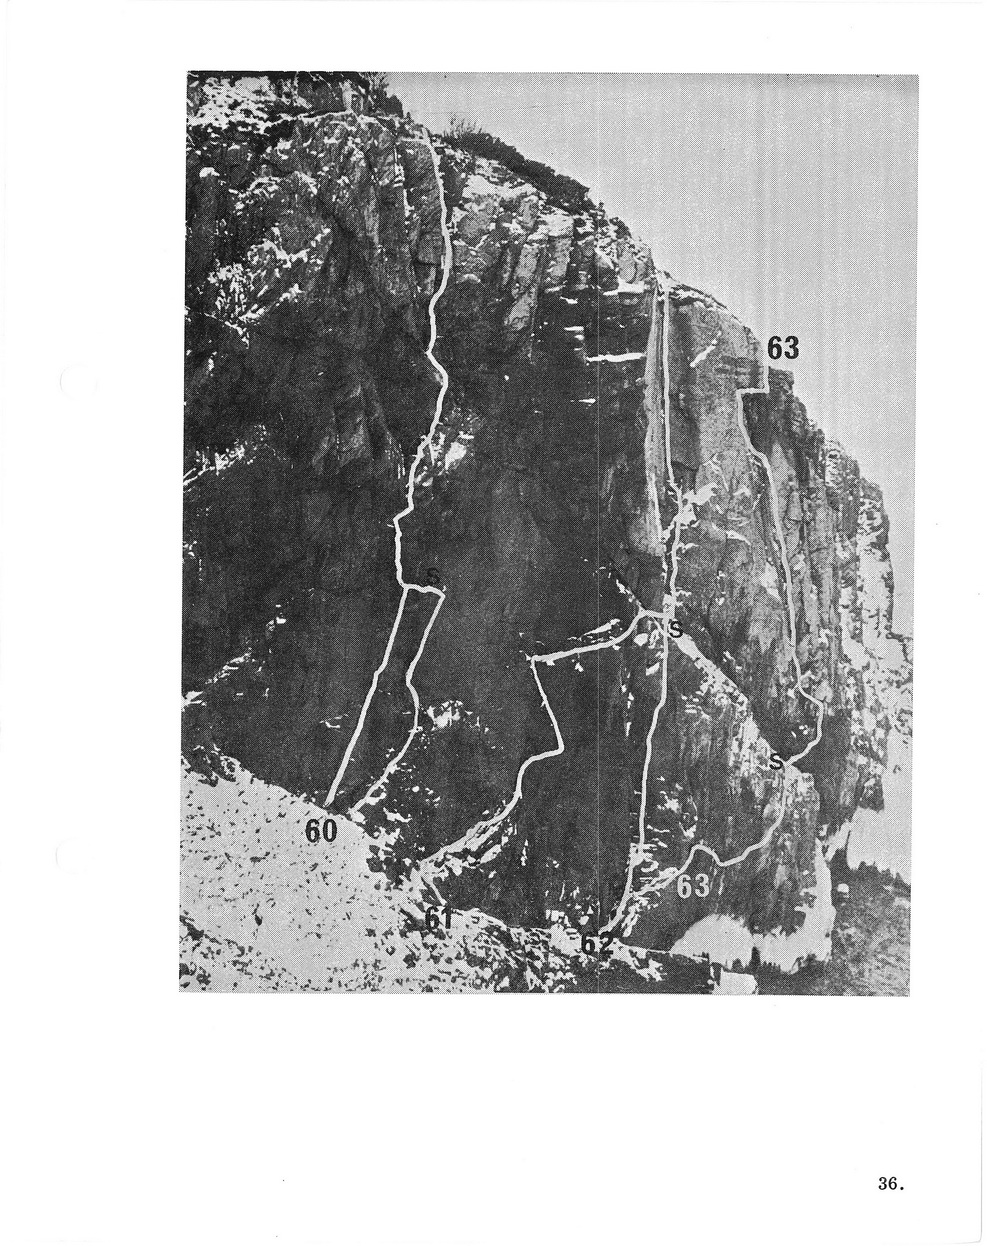 Kullen guide 1972 036.jpg